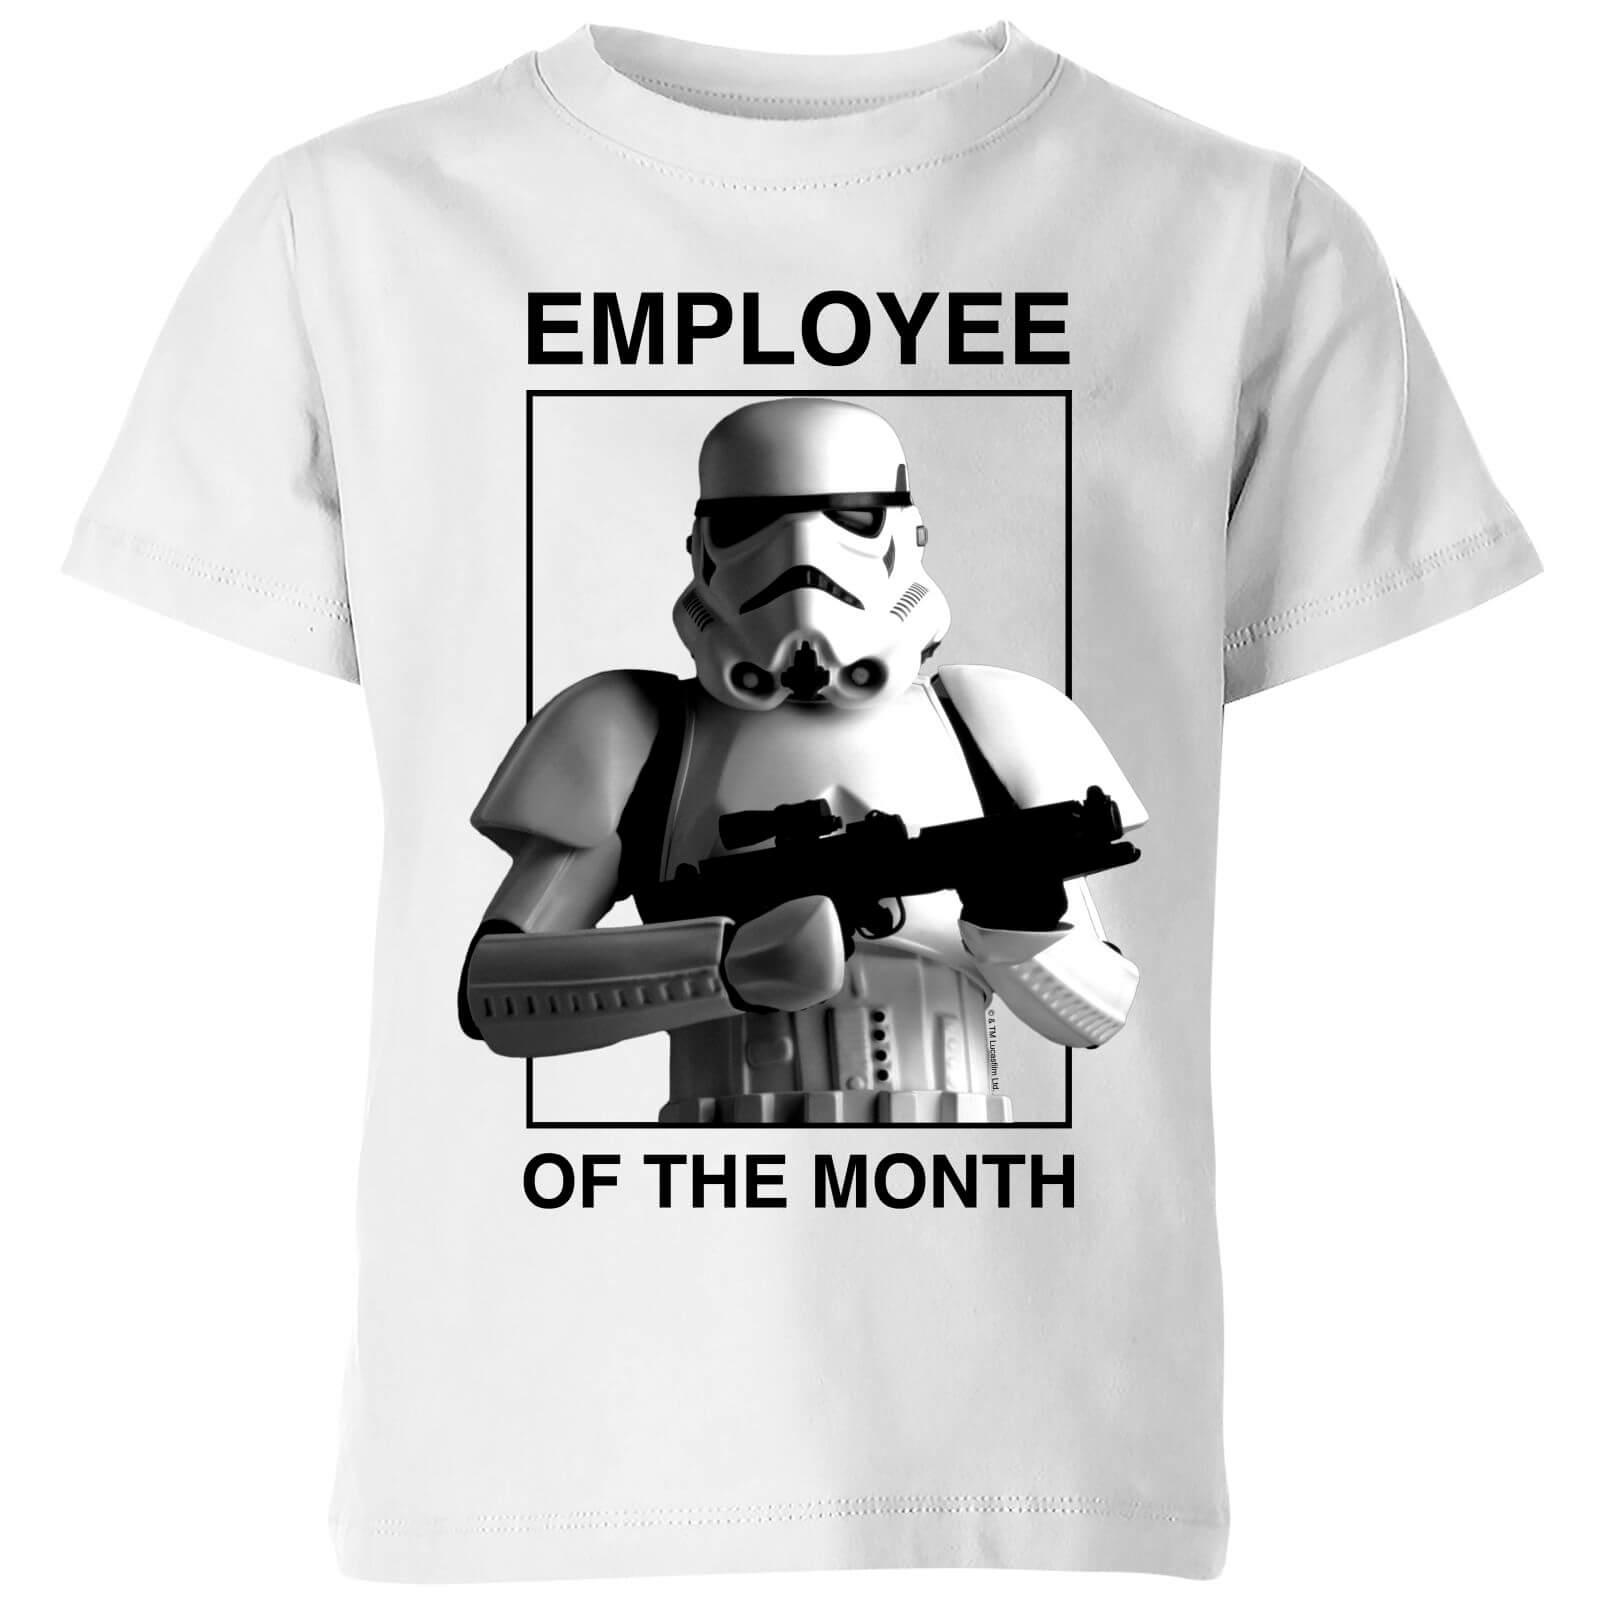 Star Wars T-Shirt Enfant Employé du Mois Star Wars Classic - Blanc - 5-6 ans - Blanc